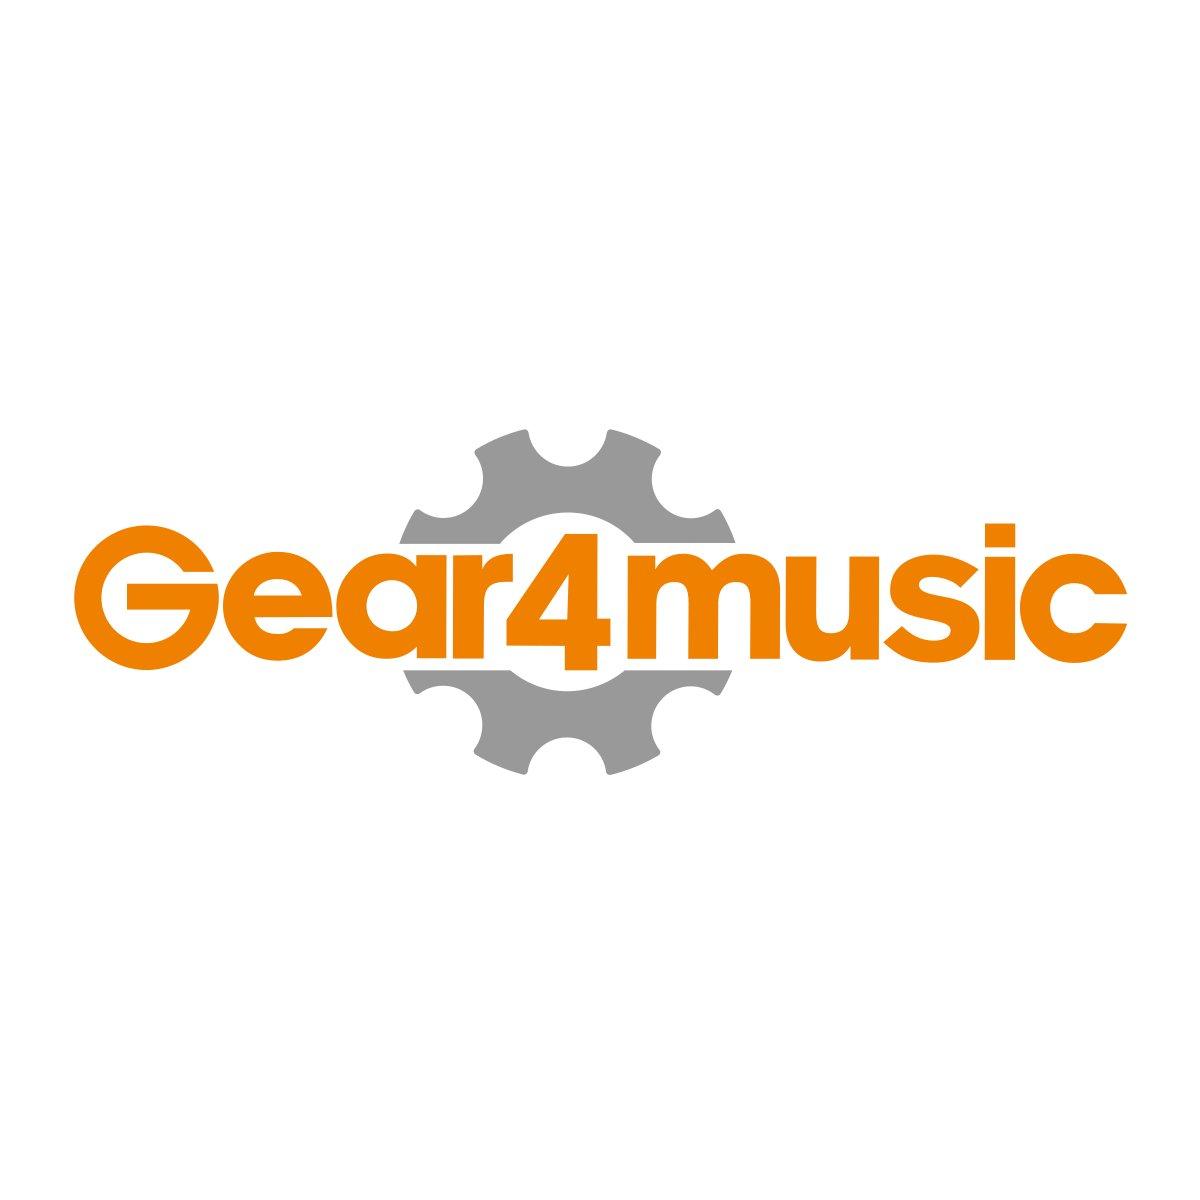 JDP-1 Junior Digital Piano by Gear4music